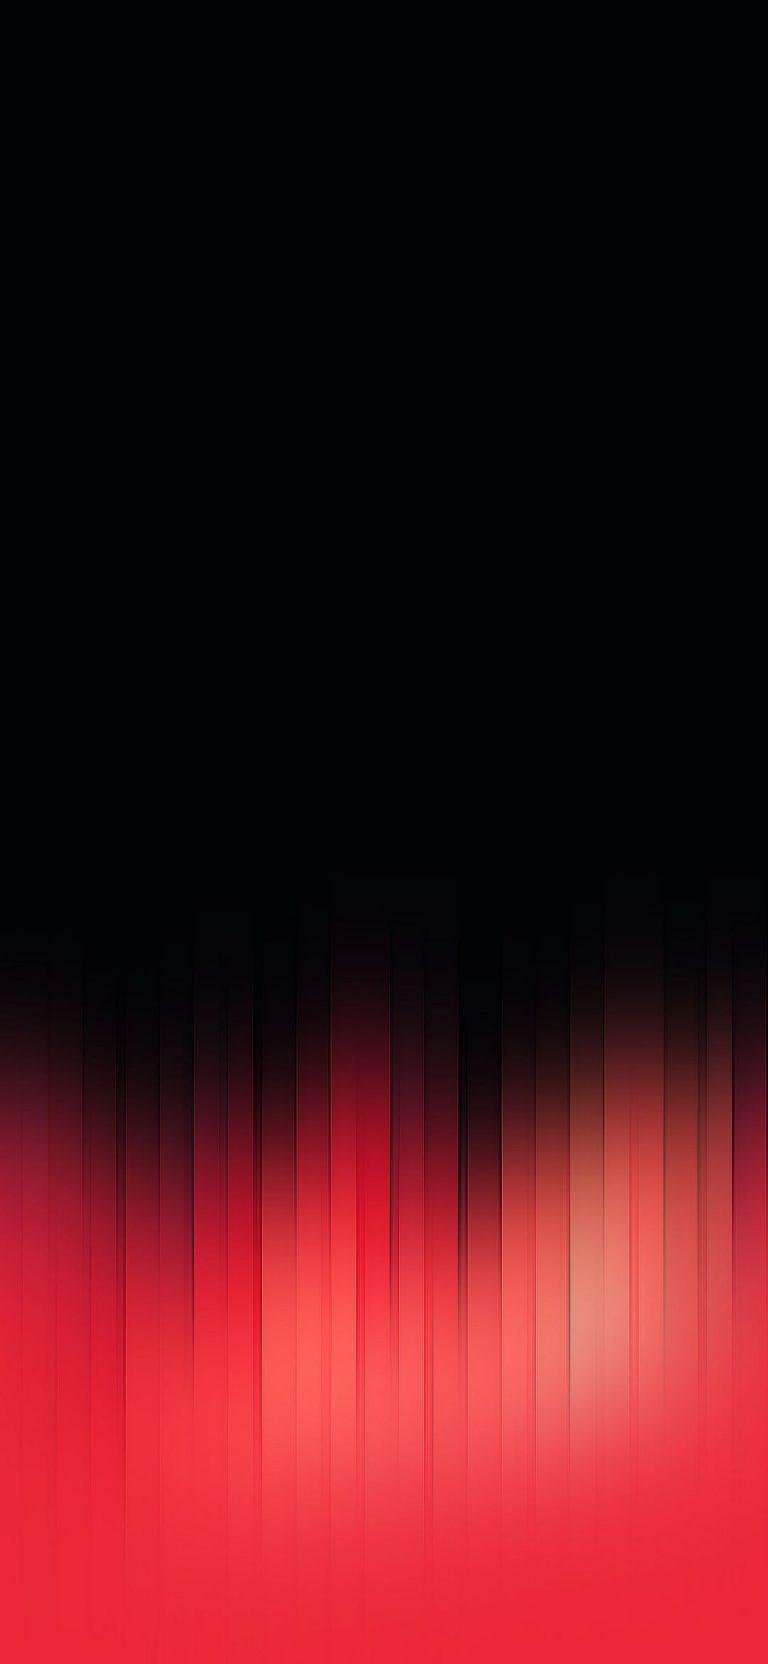 Dark Phone Wallpaper 067 1080x2340 768x1664